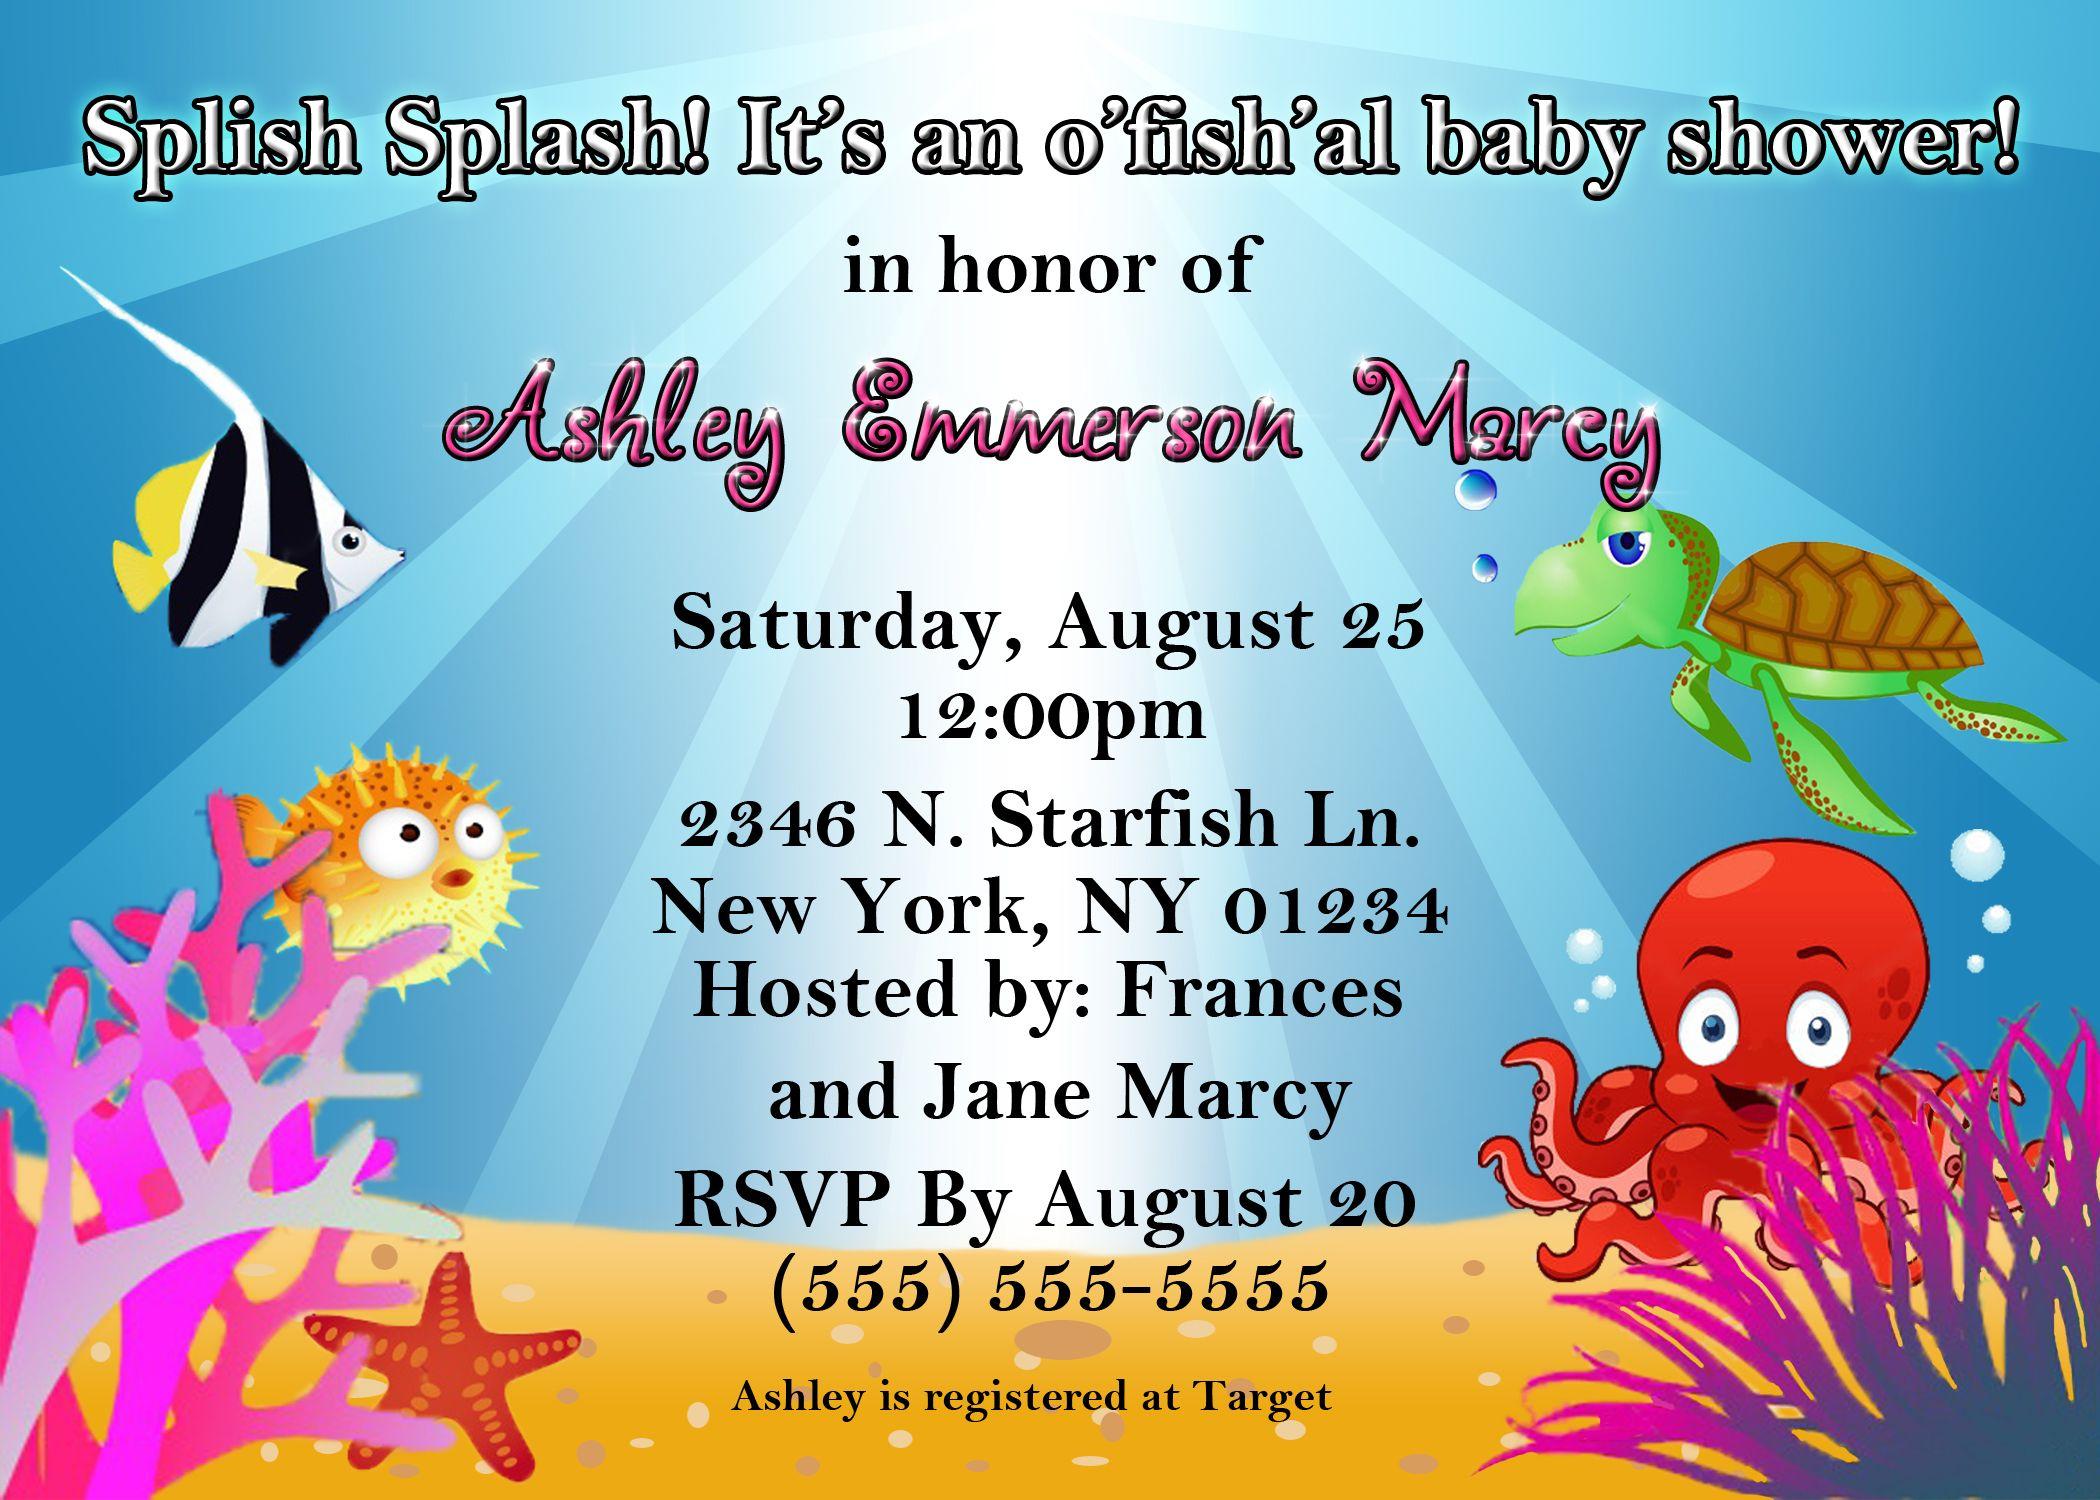 Under The Sea Baby Shower Theme | Ocean Theme Baby Shower Invitation Design